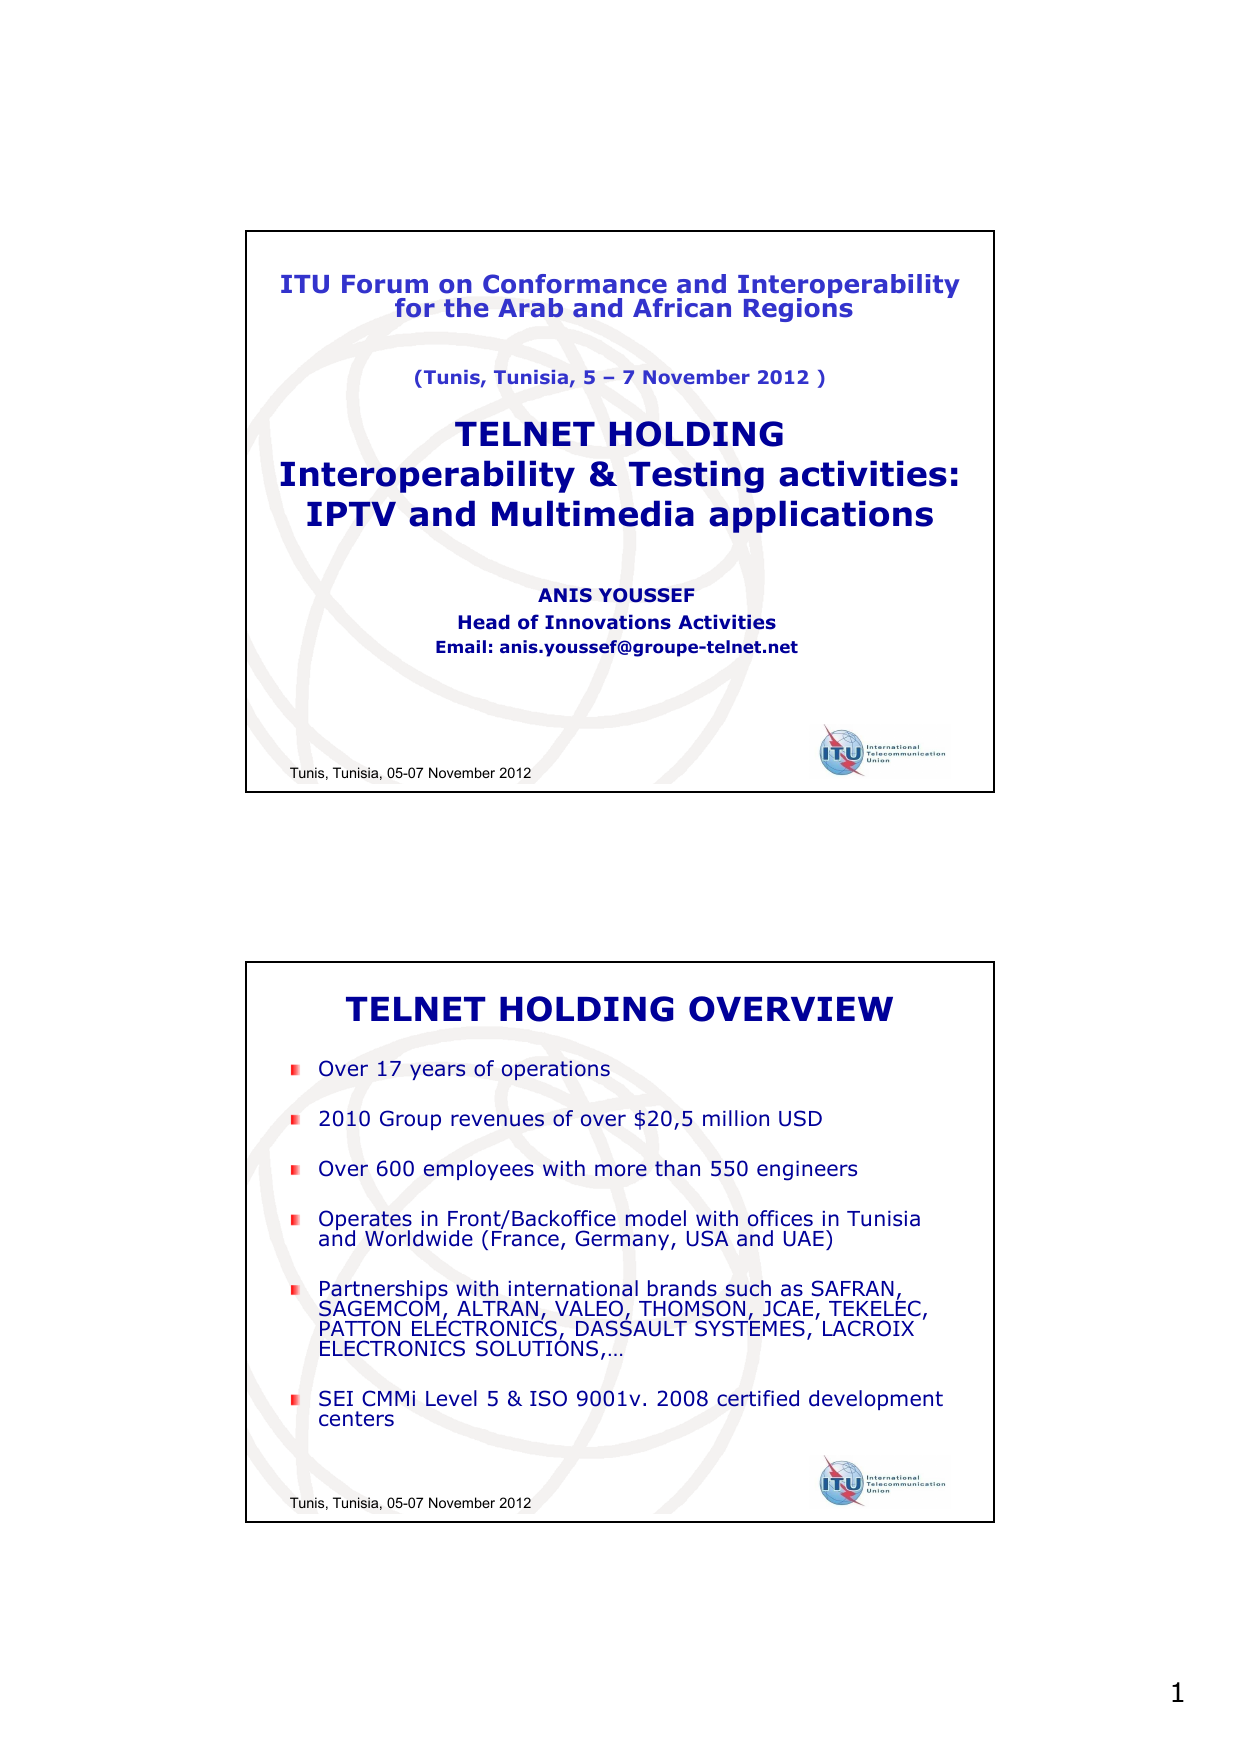 TELNET HOLDING Interoperability & Testing activities: IPTV